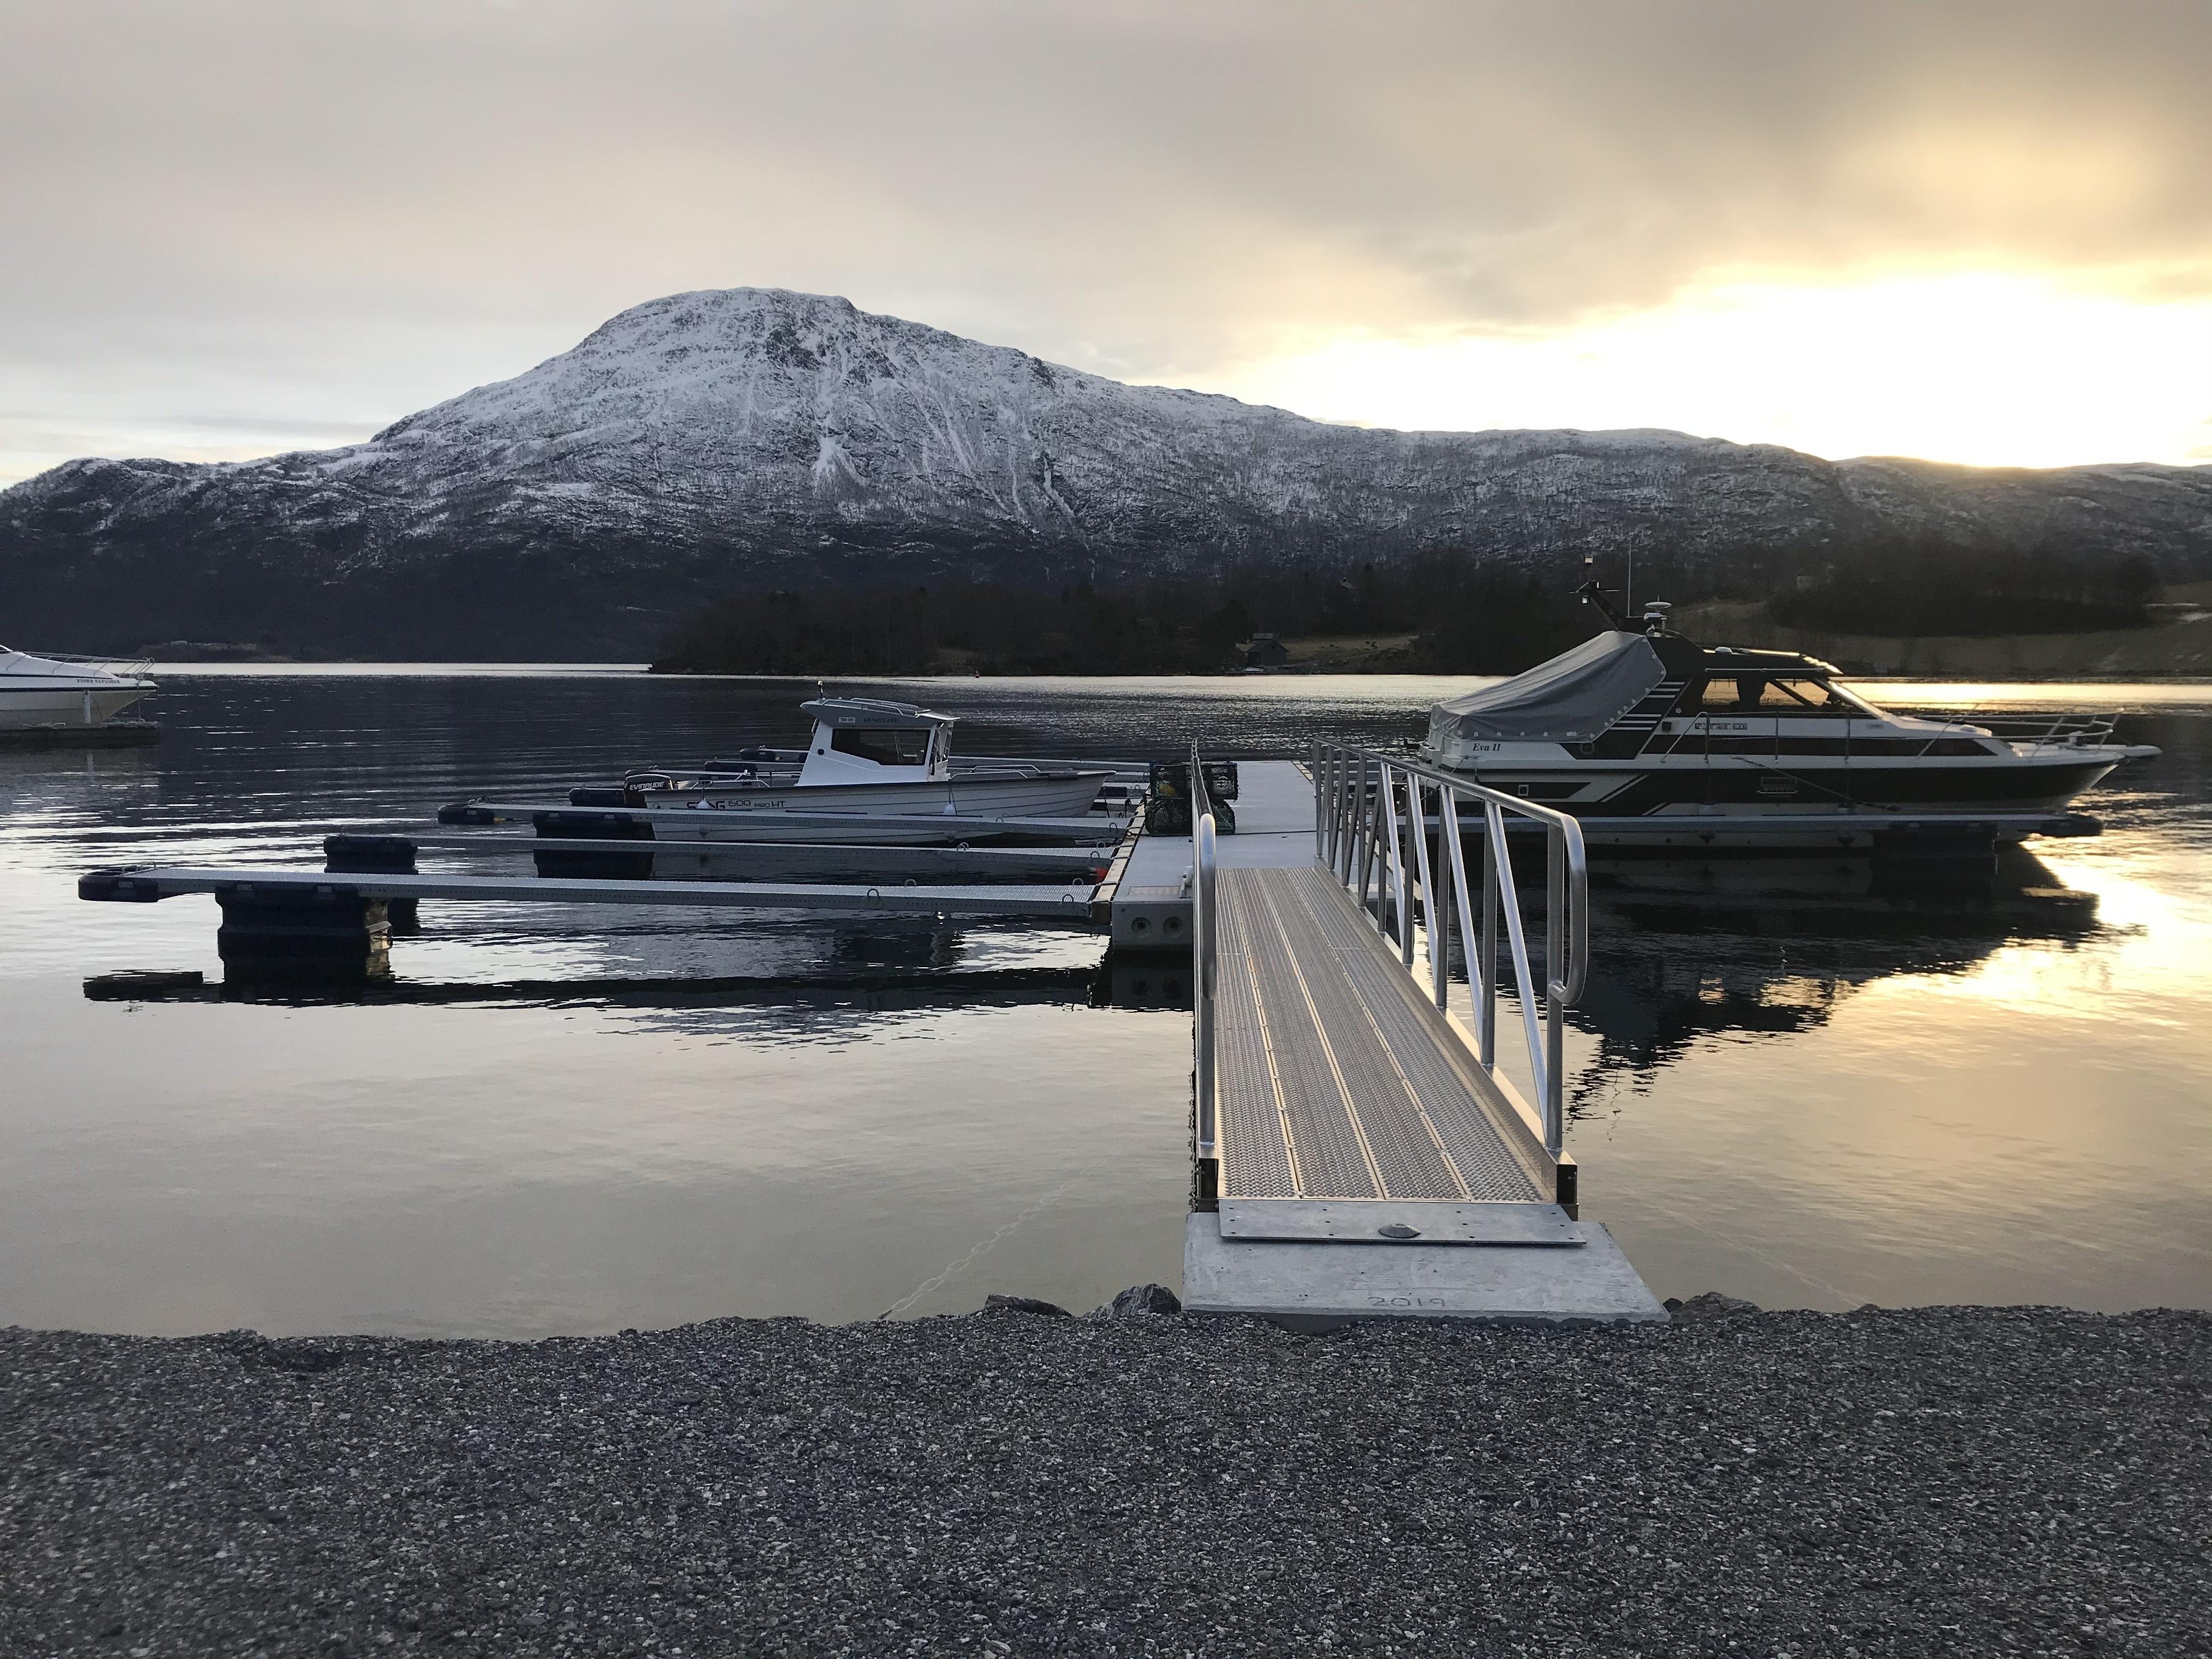 https://www.marinasolutions.no/uploads/Leitafjøra-Naustlag.jpg